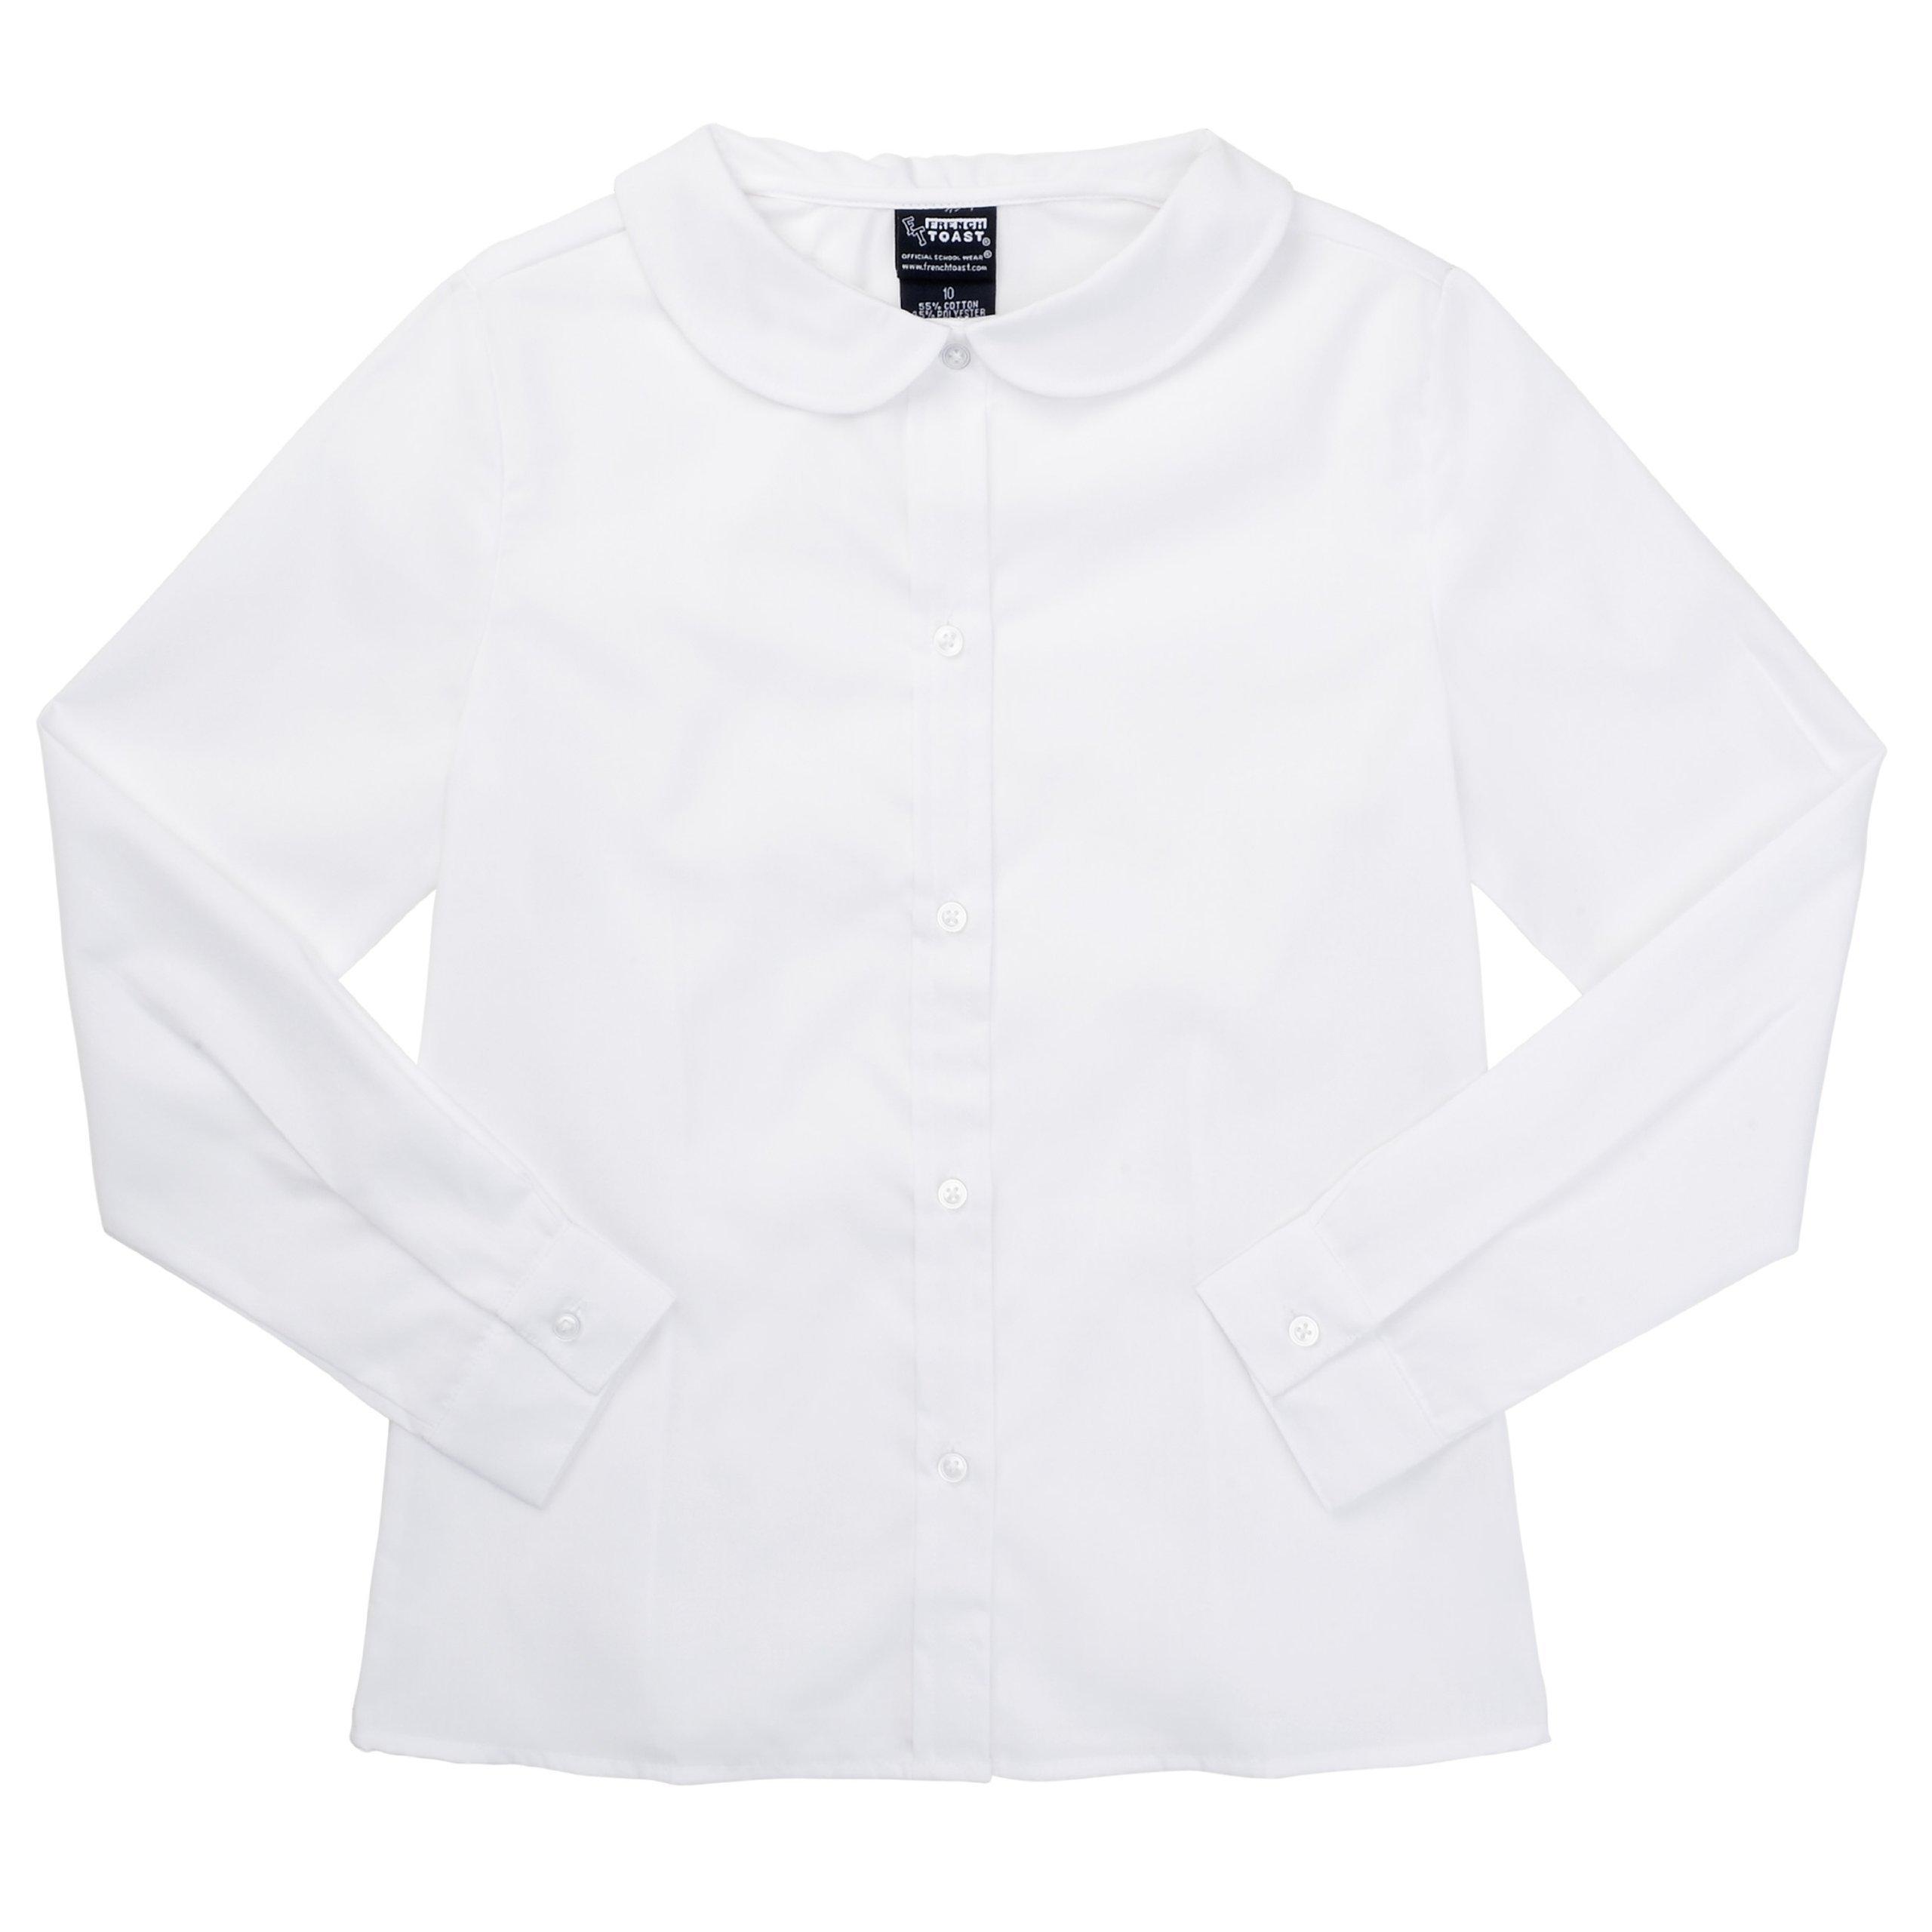 French Toast School Uniform L/S Peter Pan Blouse (Sizes 7 - 20) - white, 7